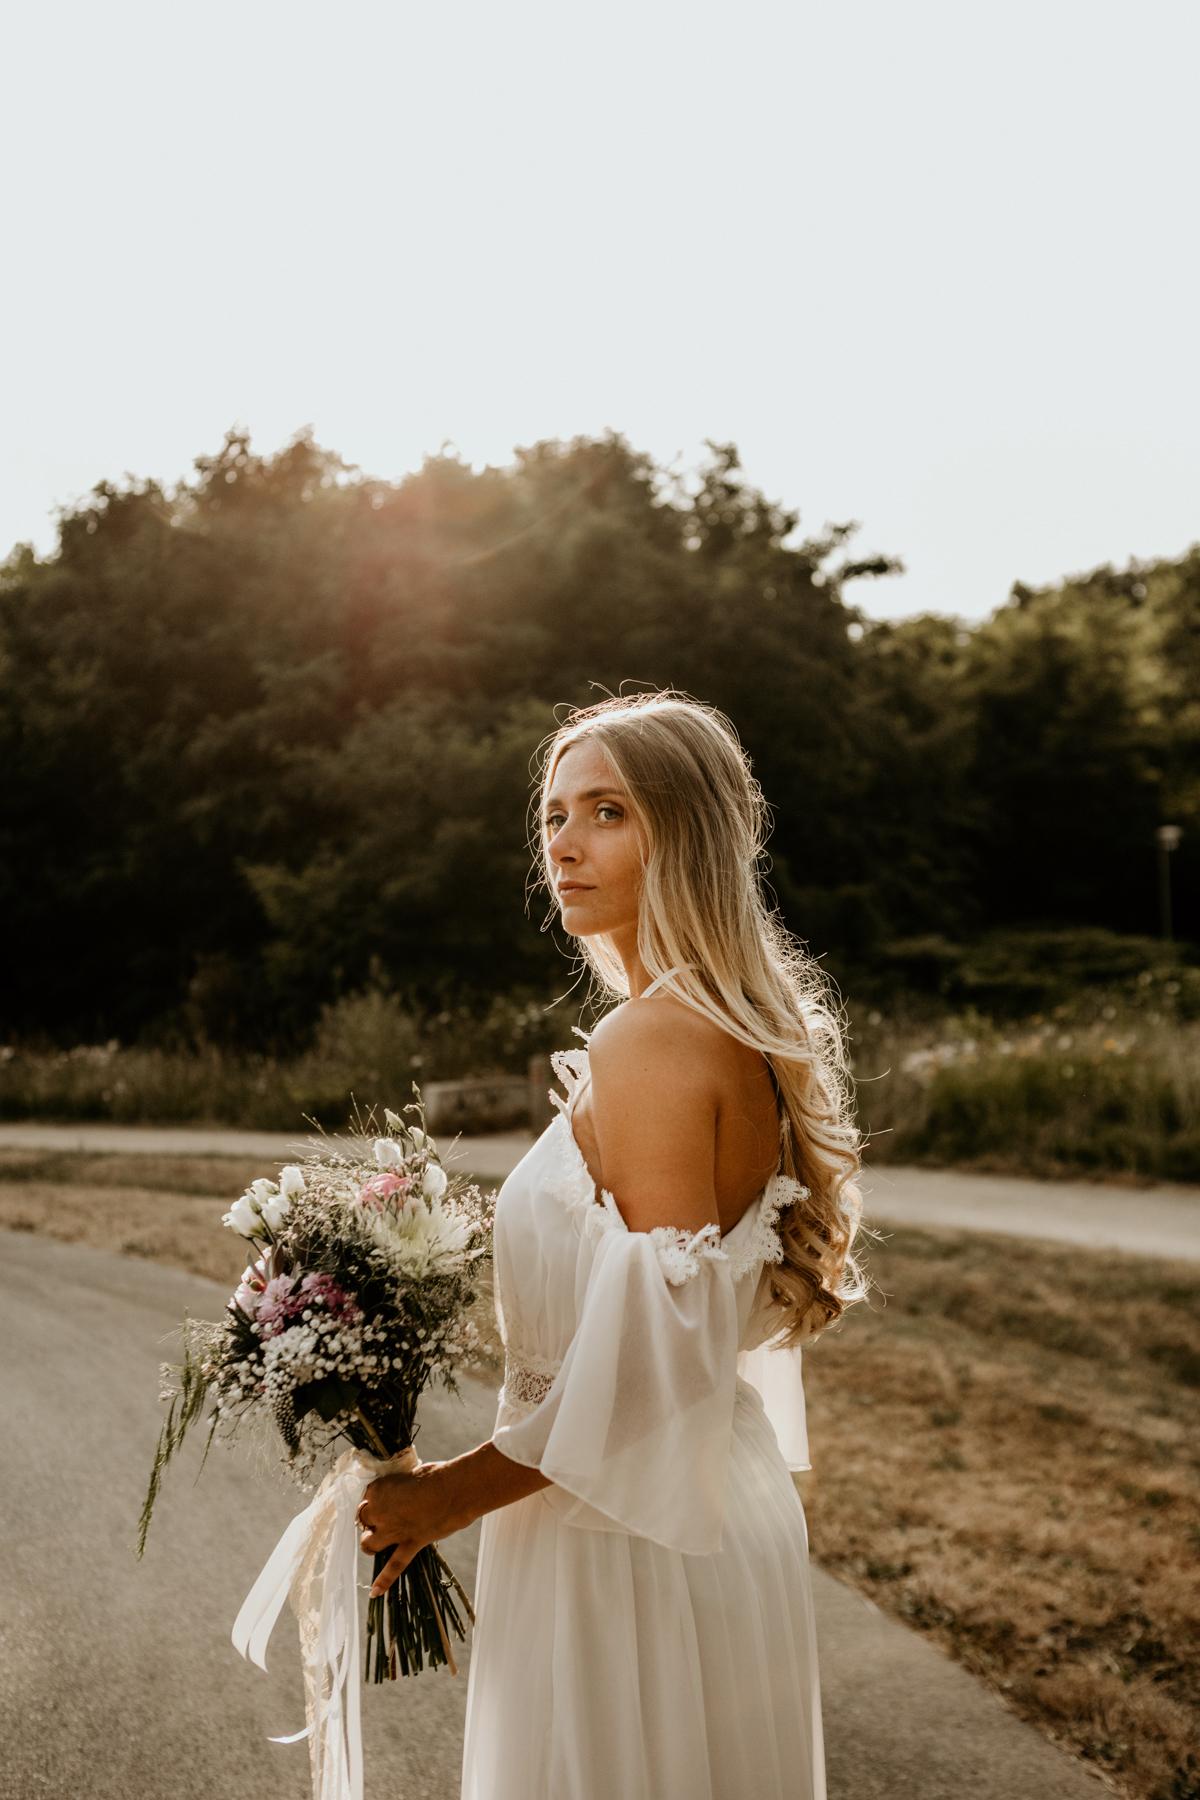 Styled Wedding 1 beeld.schoon-selinderella klein formaat-91